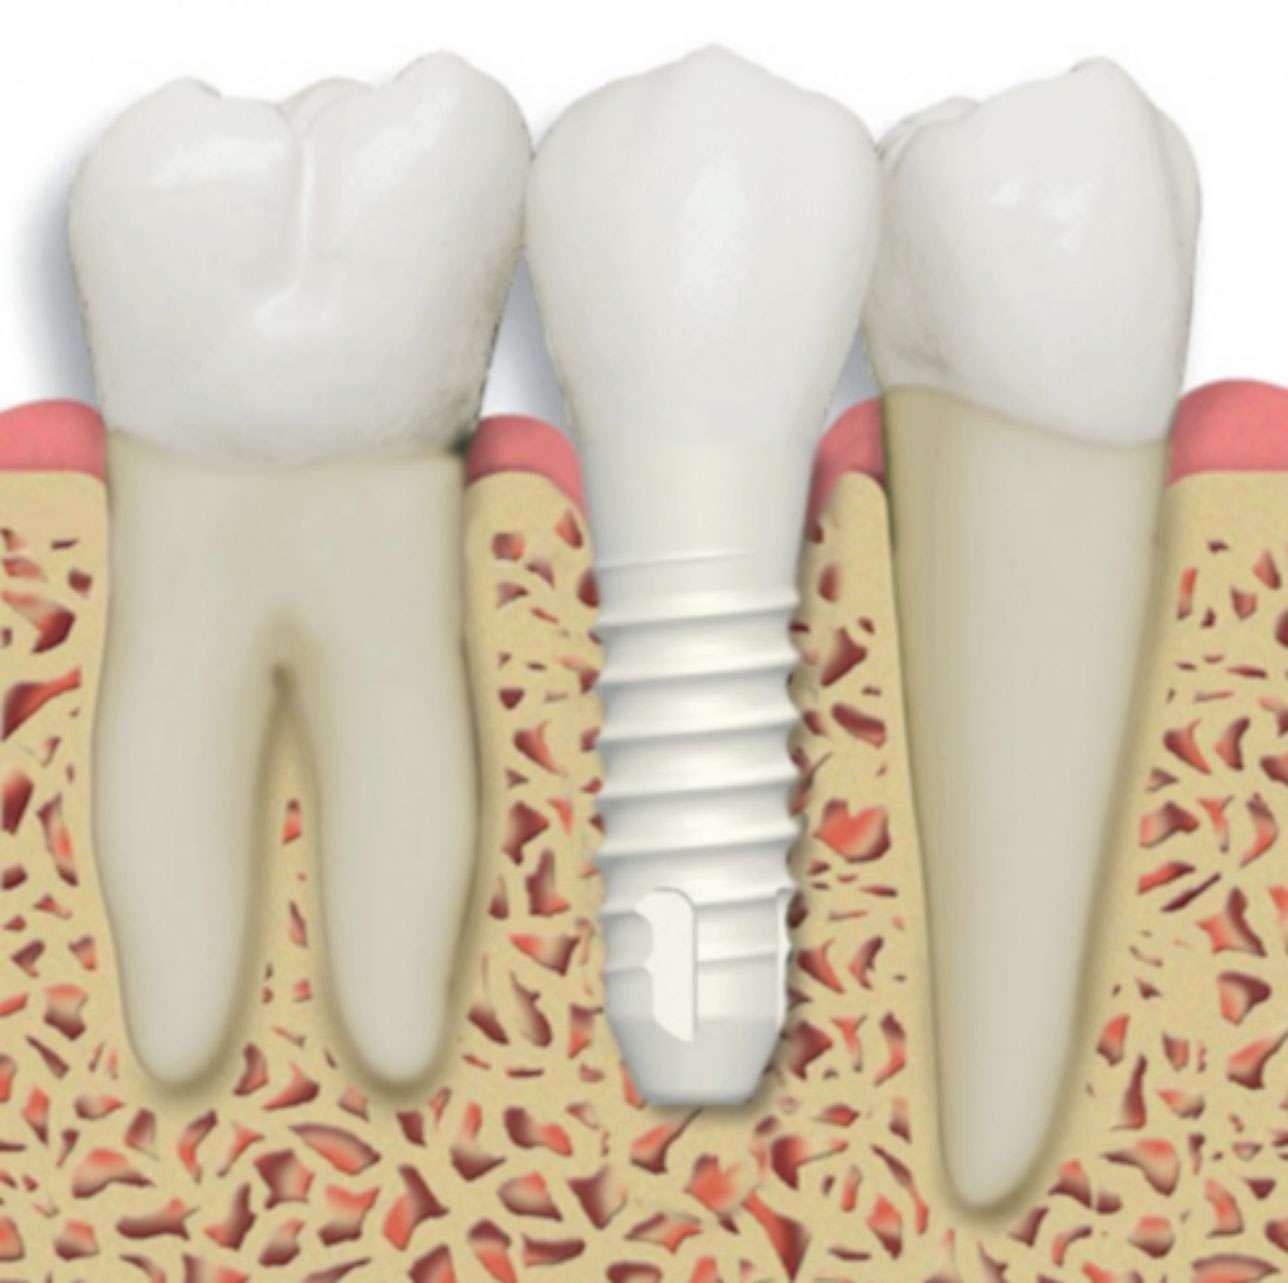 Image result for zirconium implants